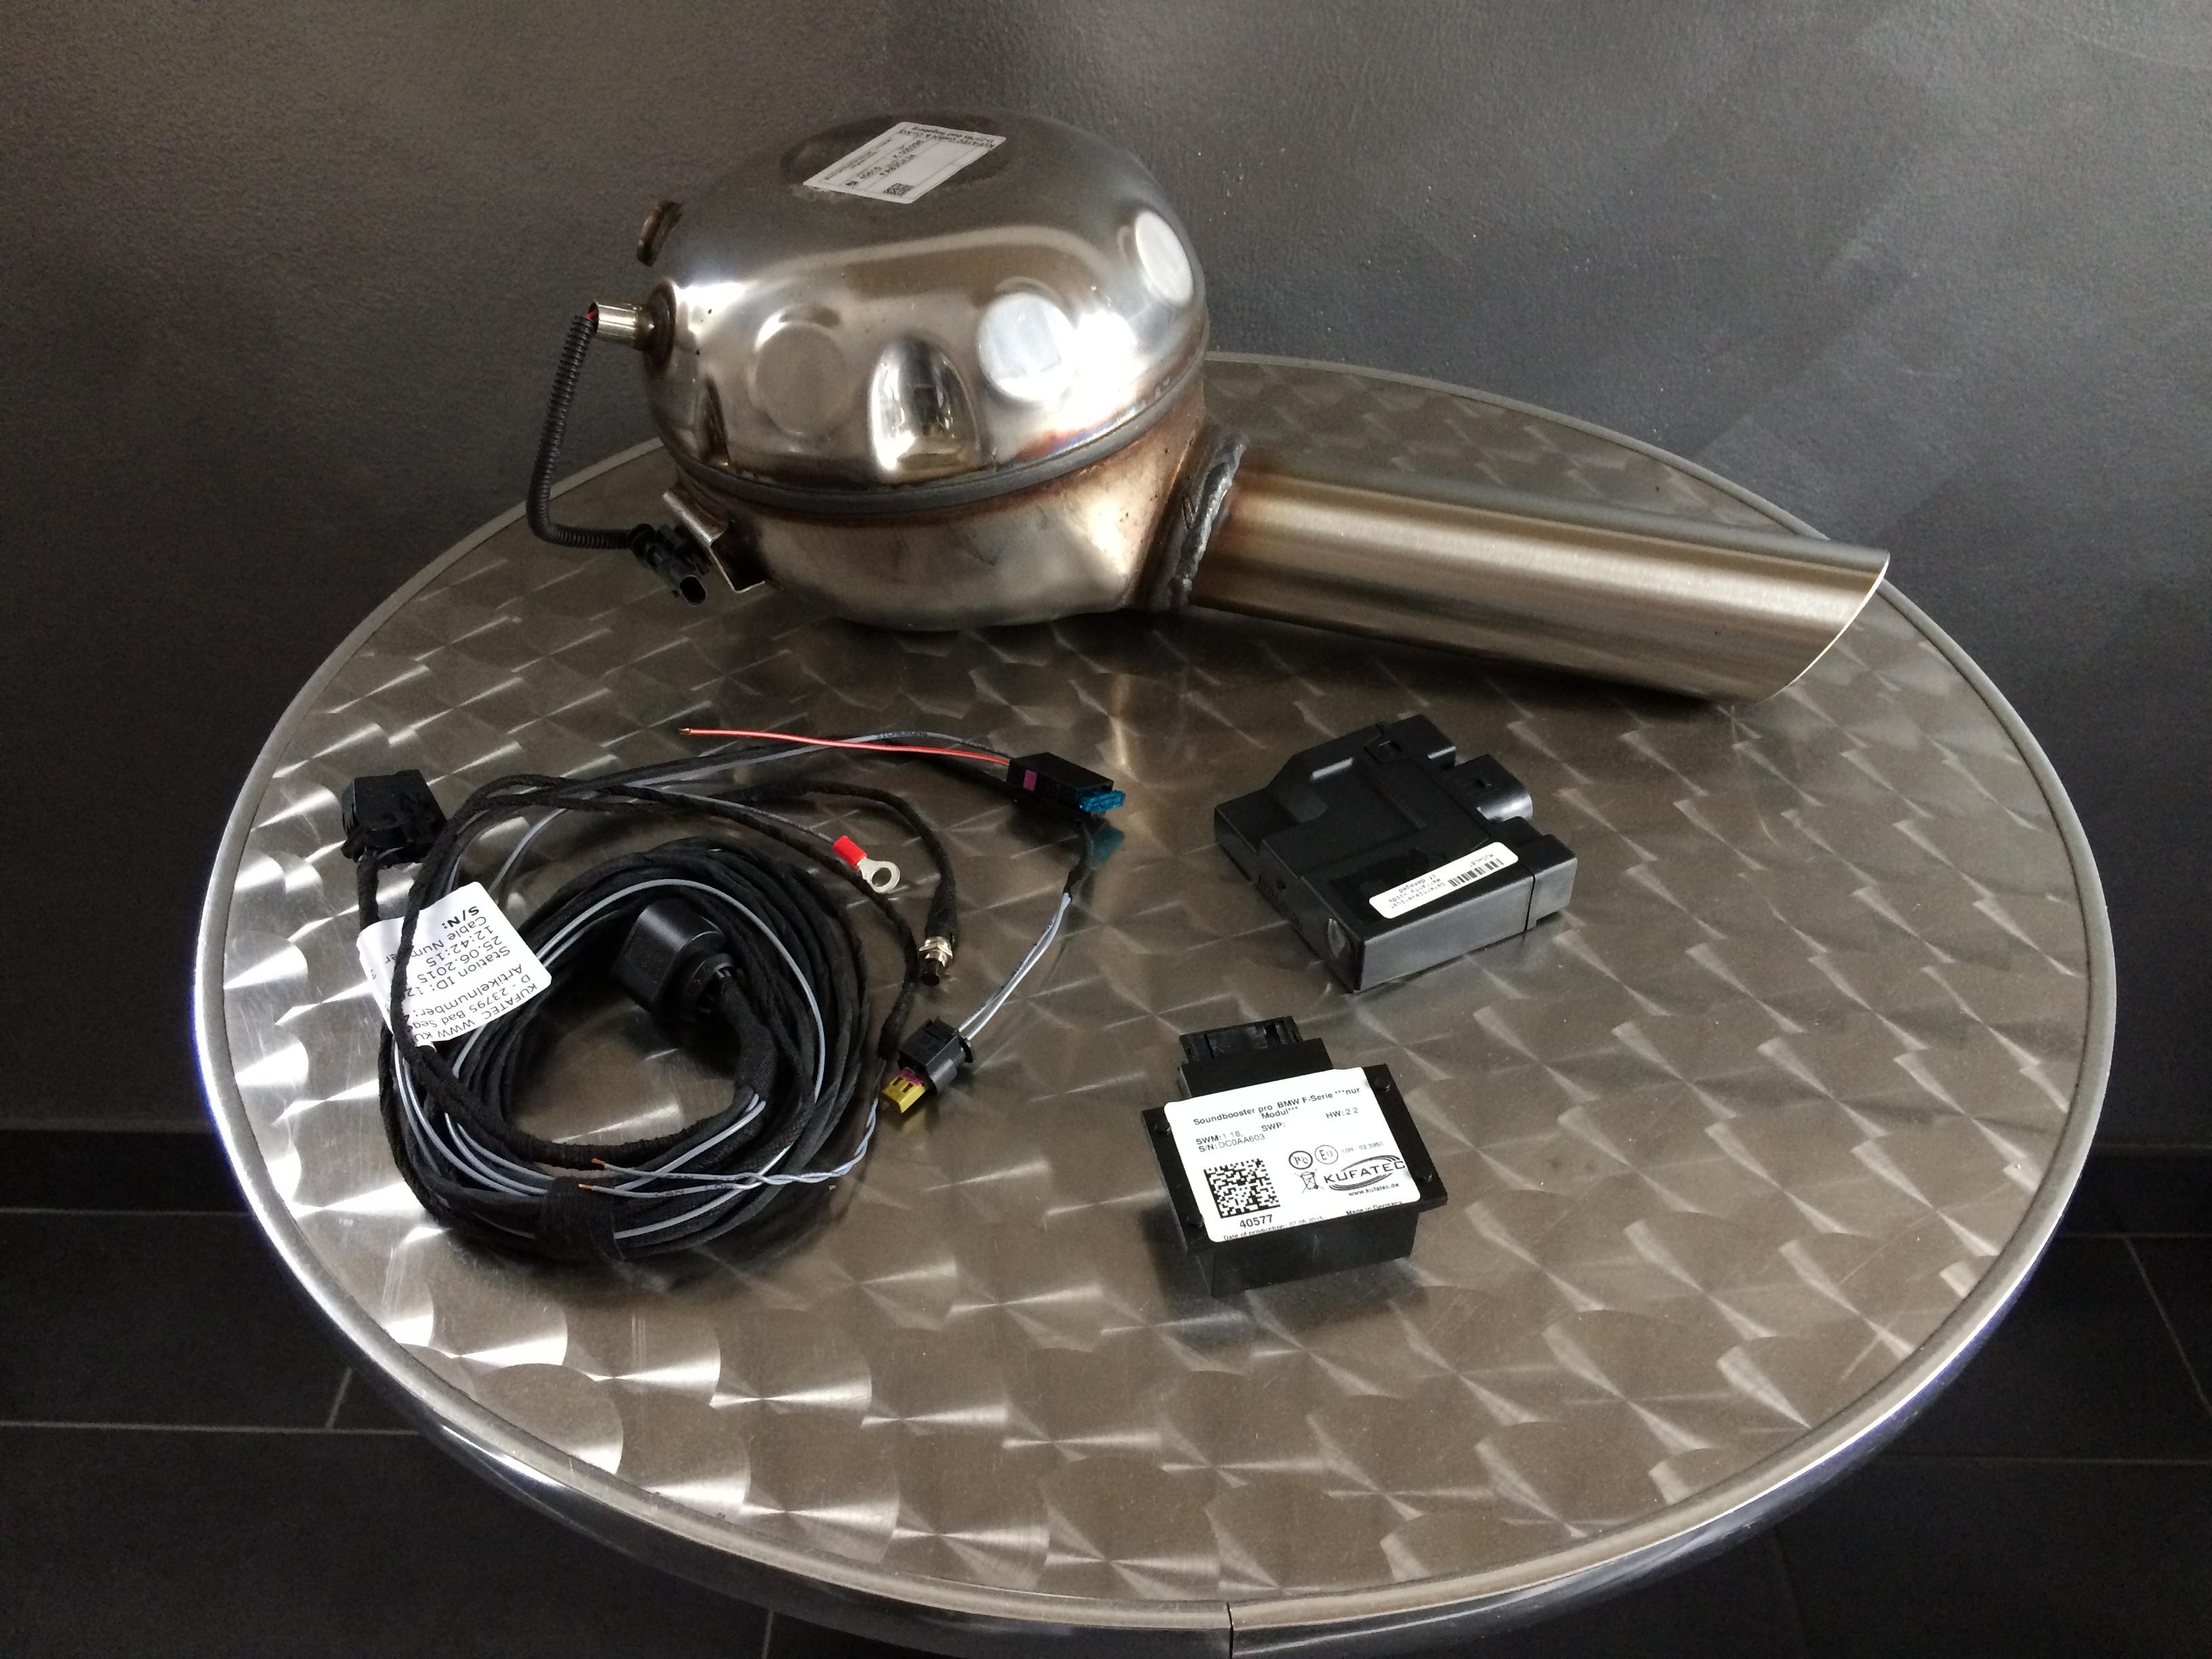 Sound Booster Pro - Motor Active Sound - VW 3 - inkl. 19% Mehrwertsteuer + Versand